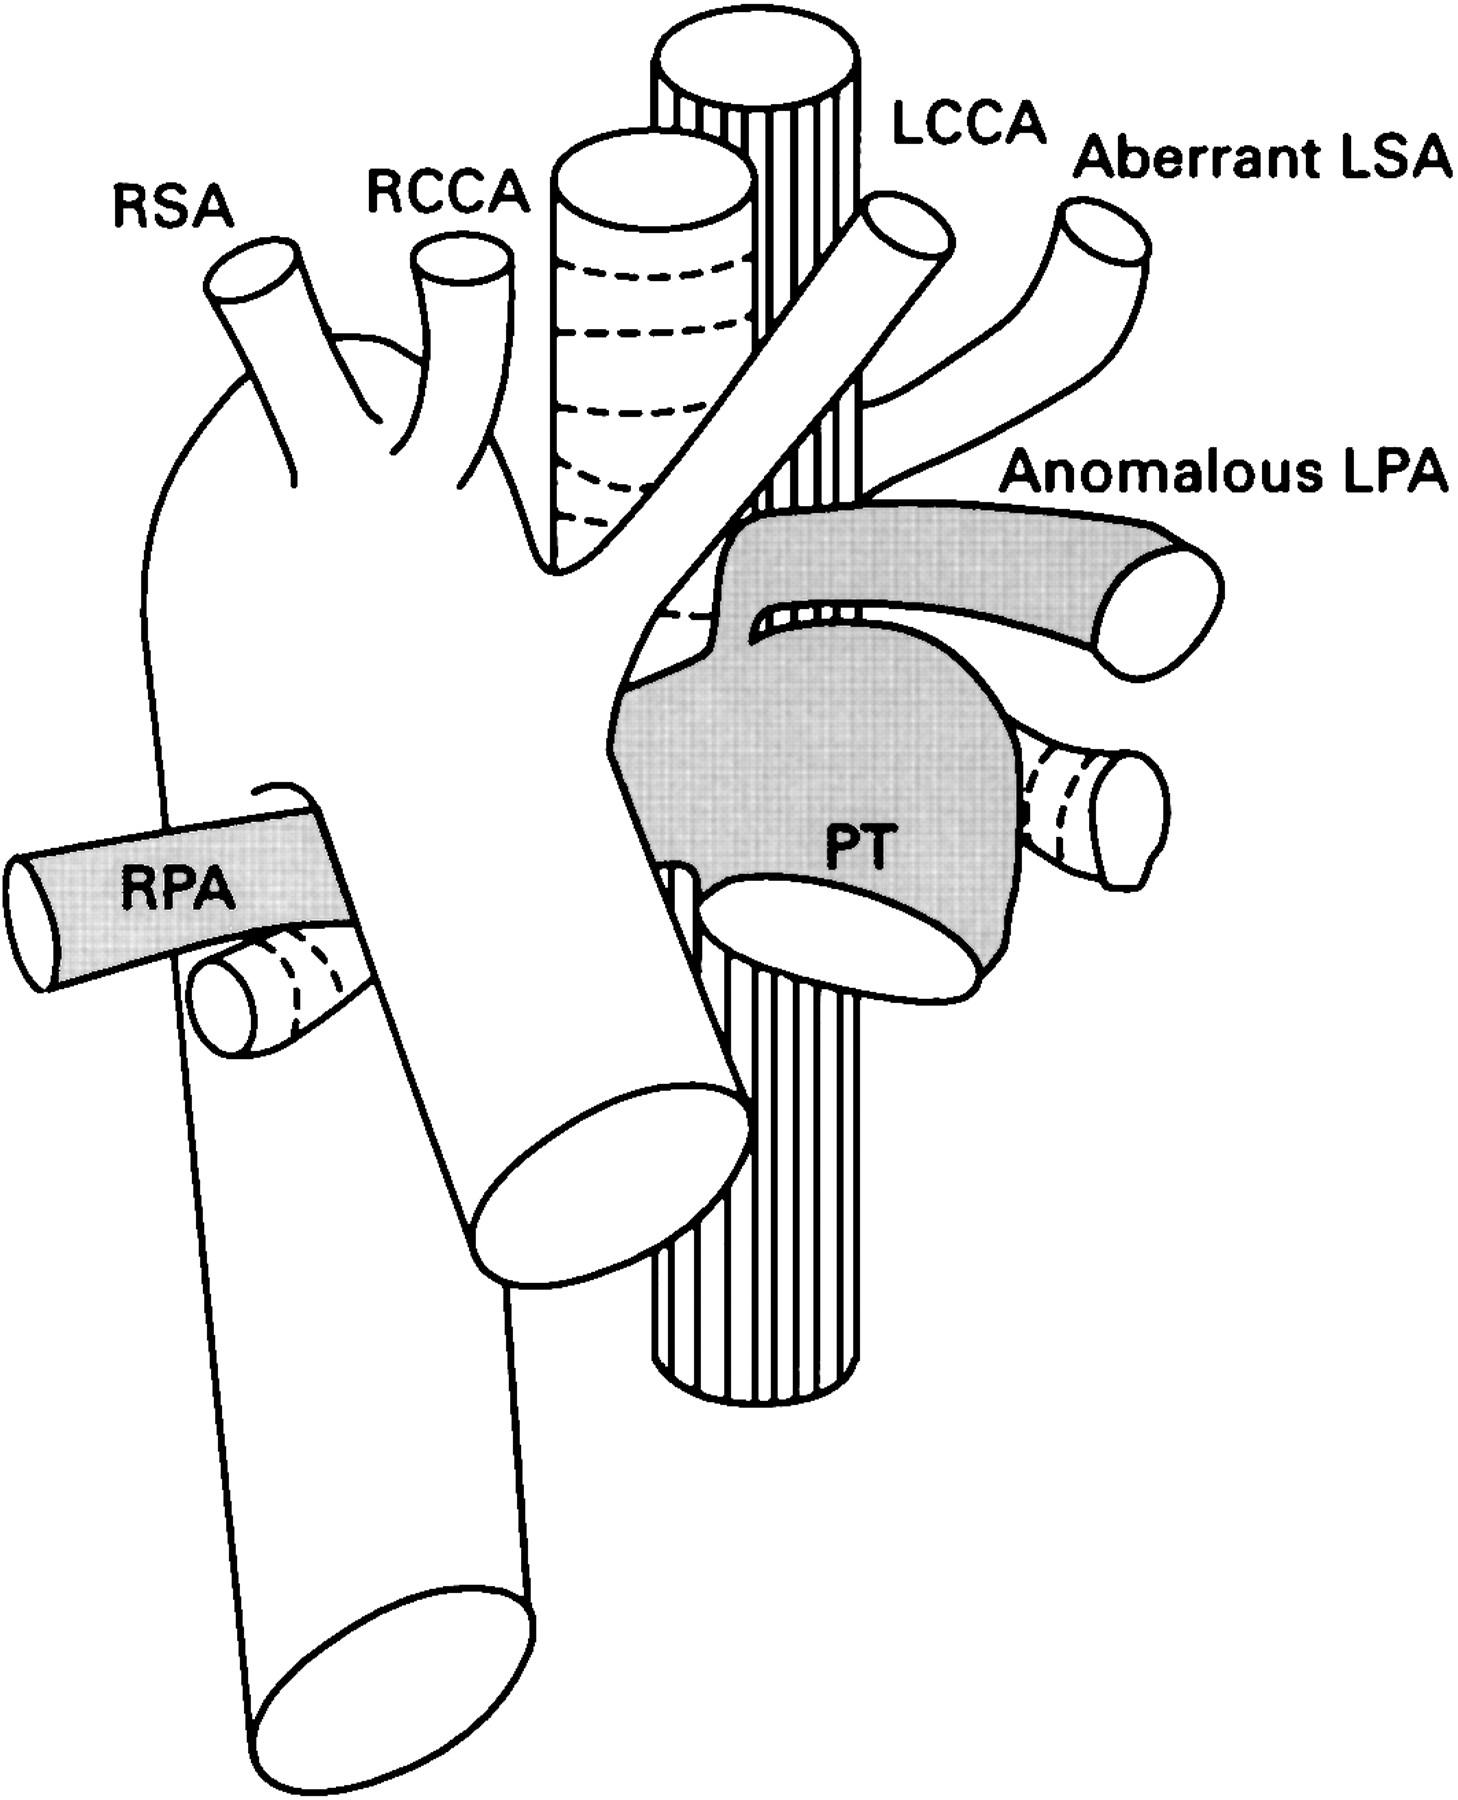 Anomalous Left Pulmonary Artery Without Pulmonary Artery Sling Heart